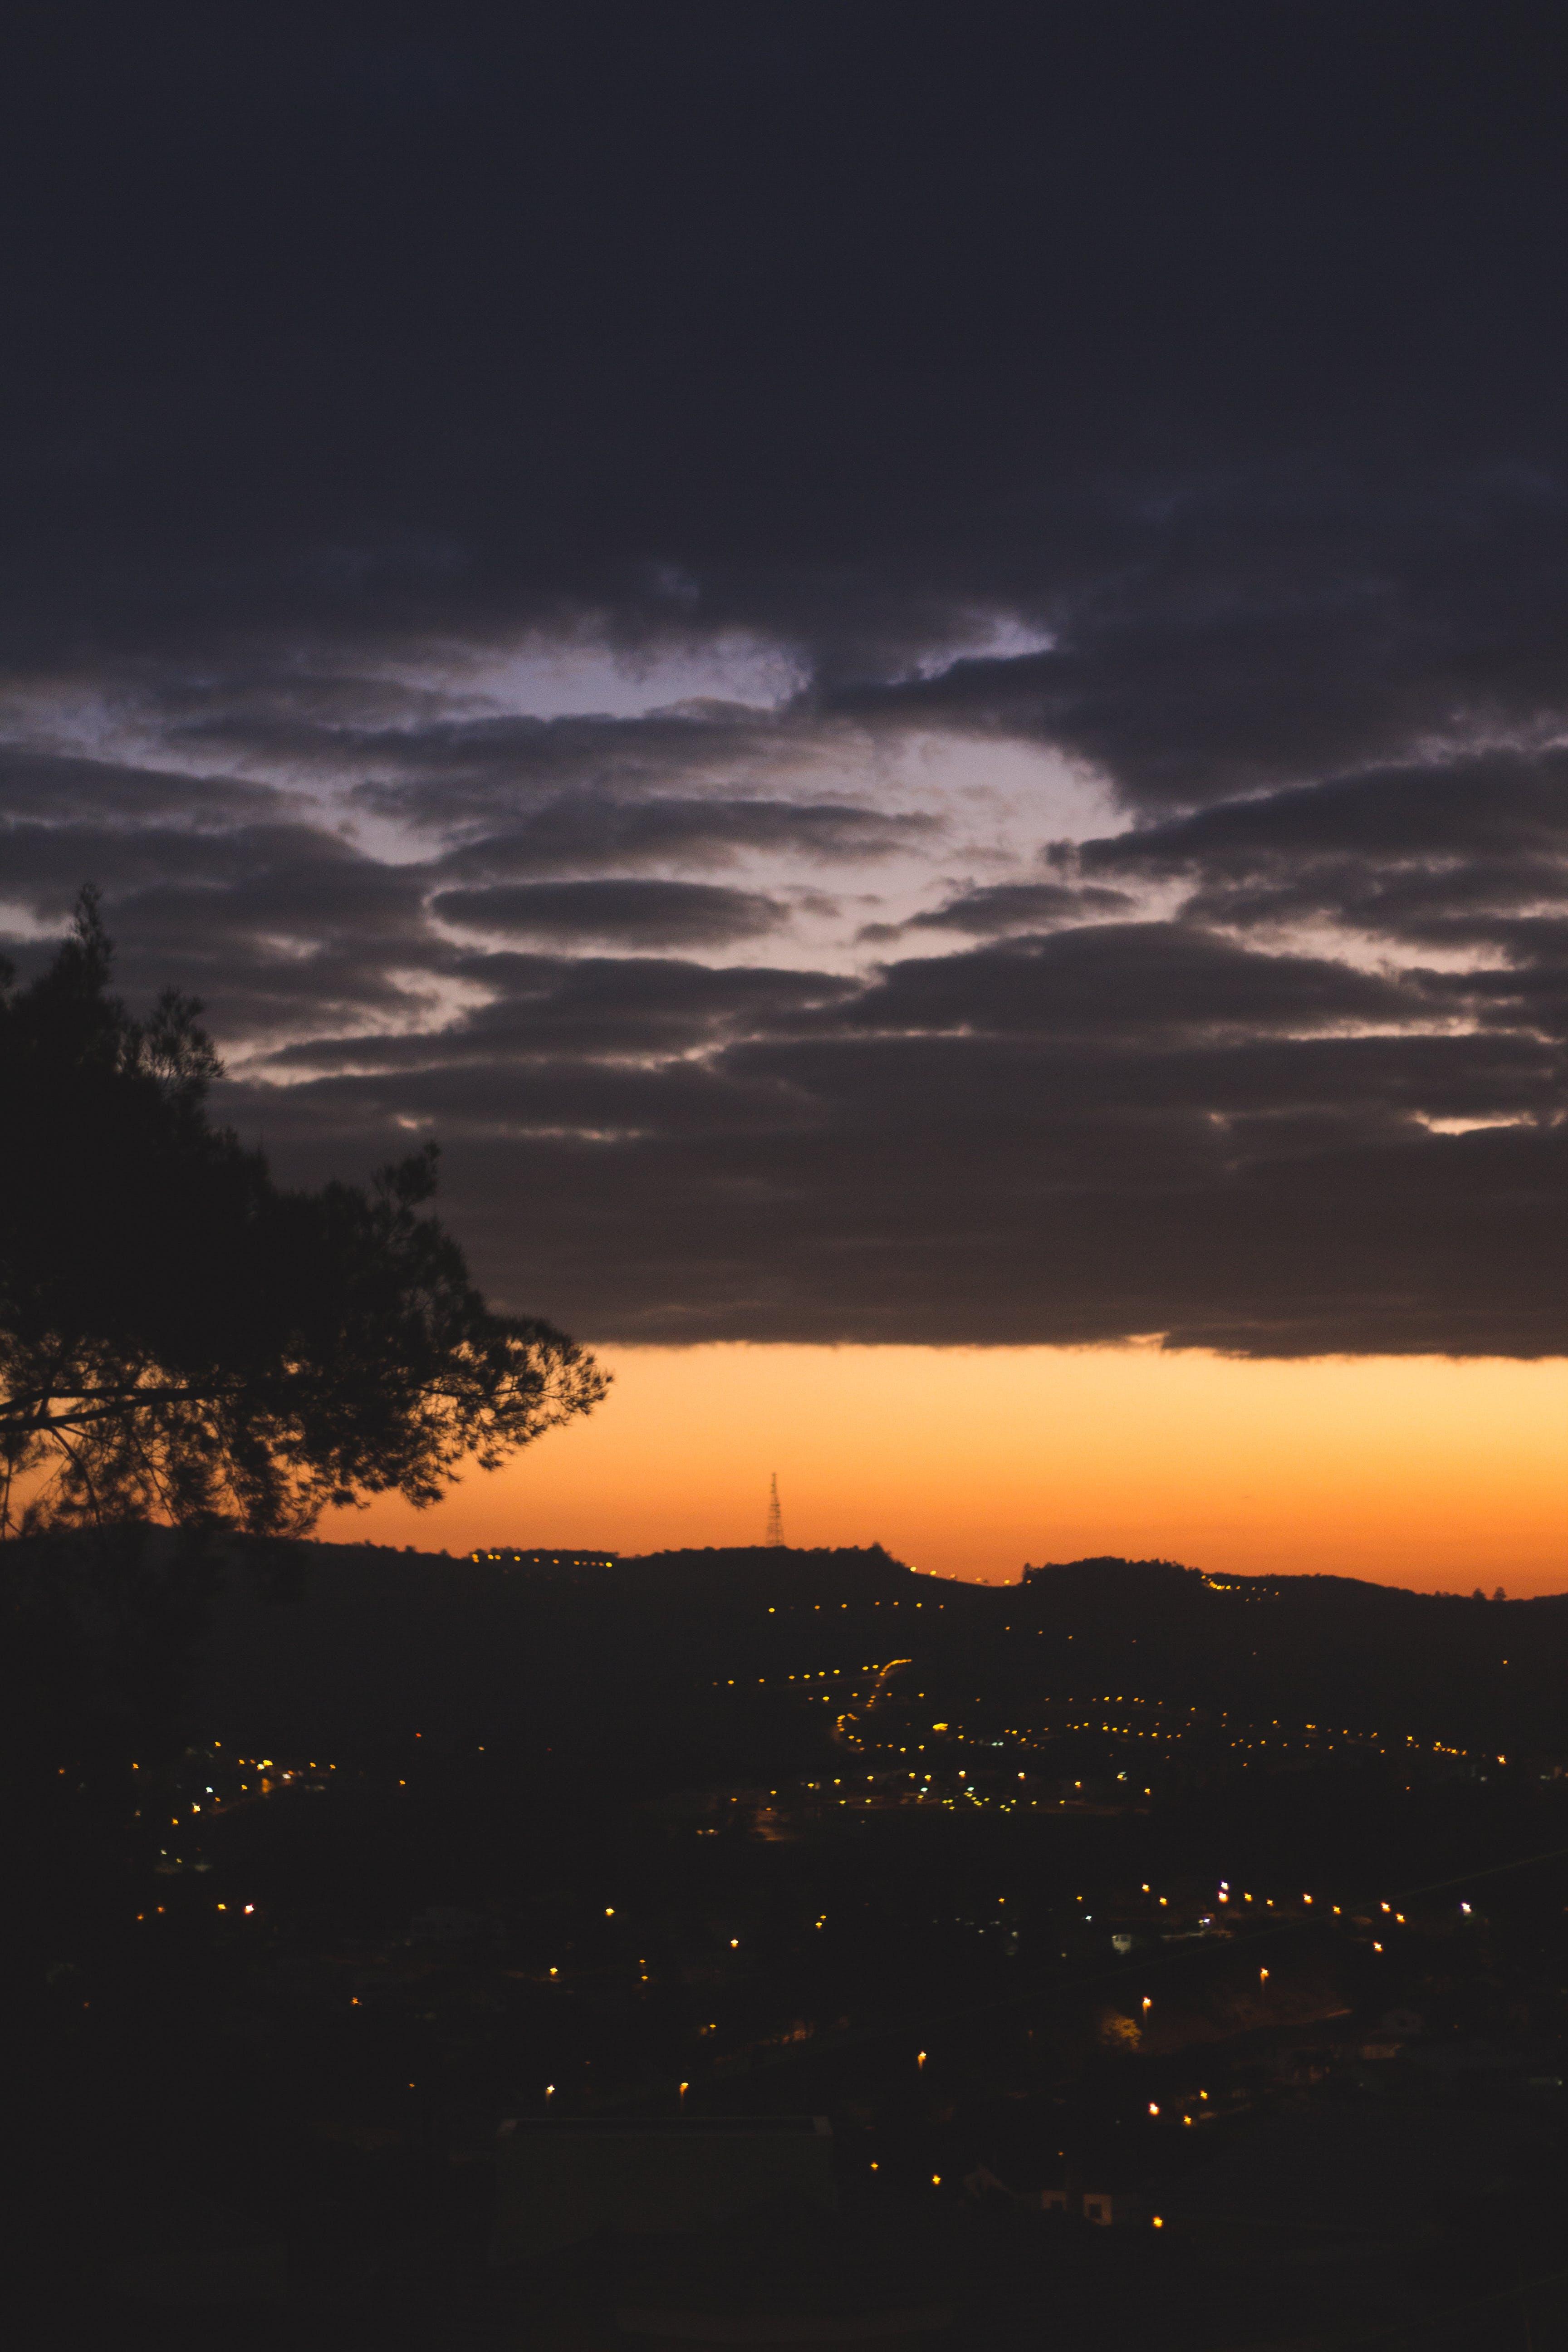 Free stock photo of sky, dramatic sky